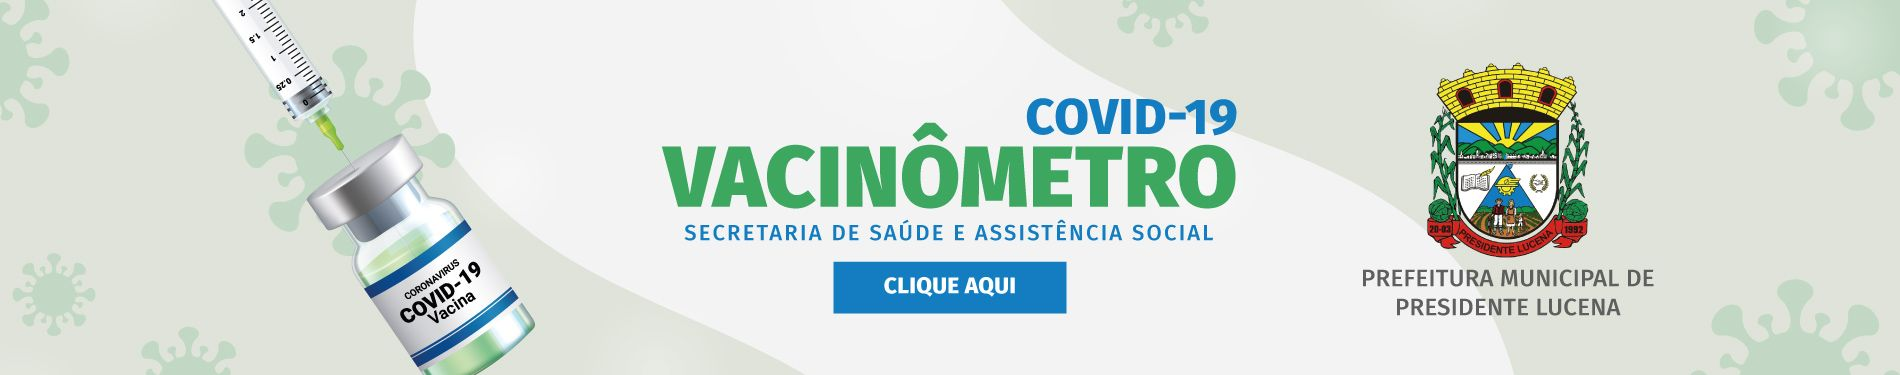 Banner 1 - Vacinômetro